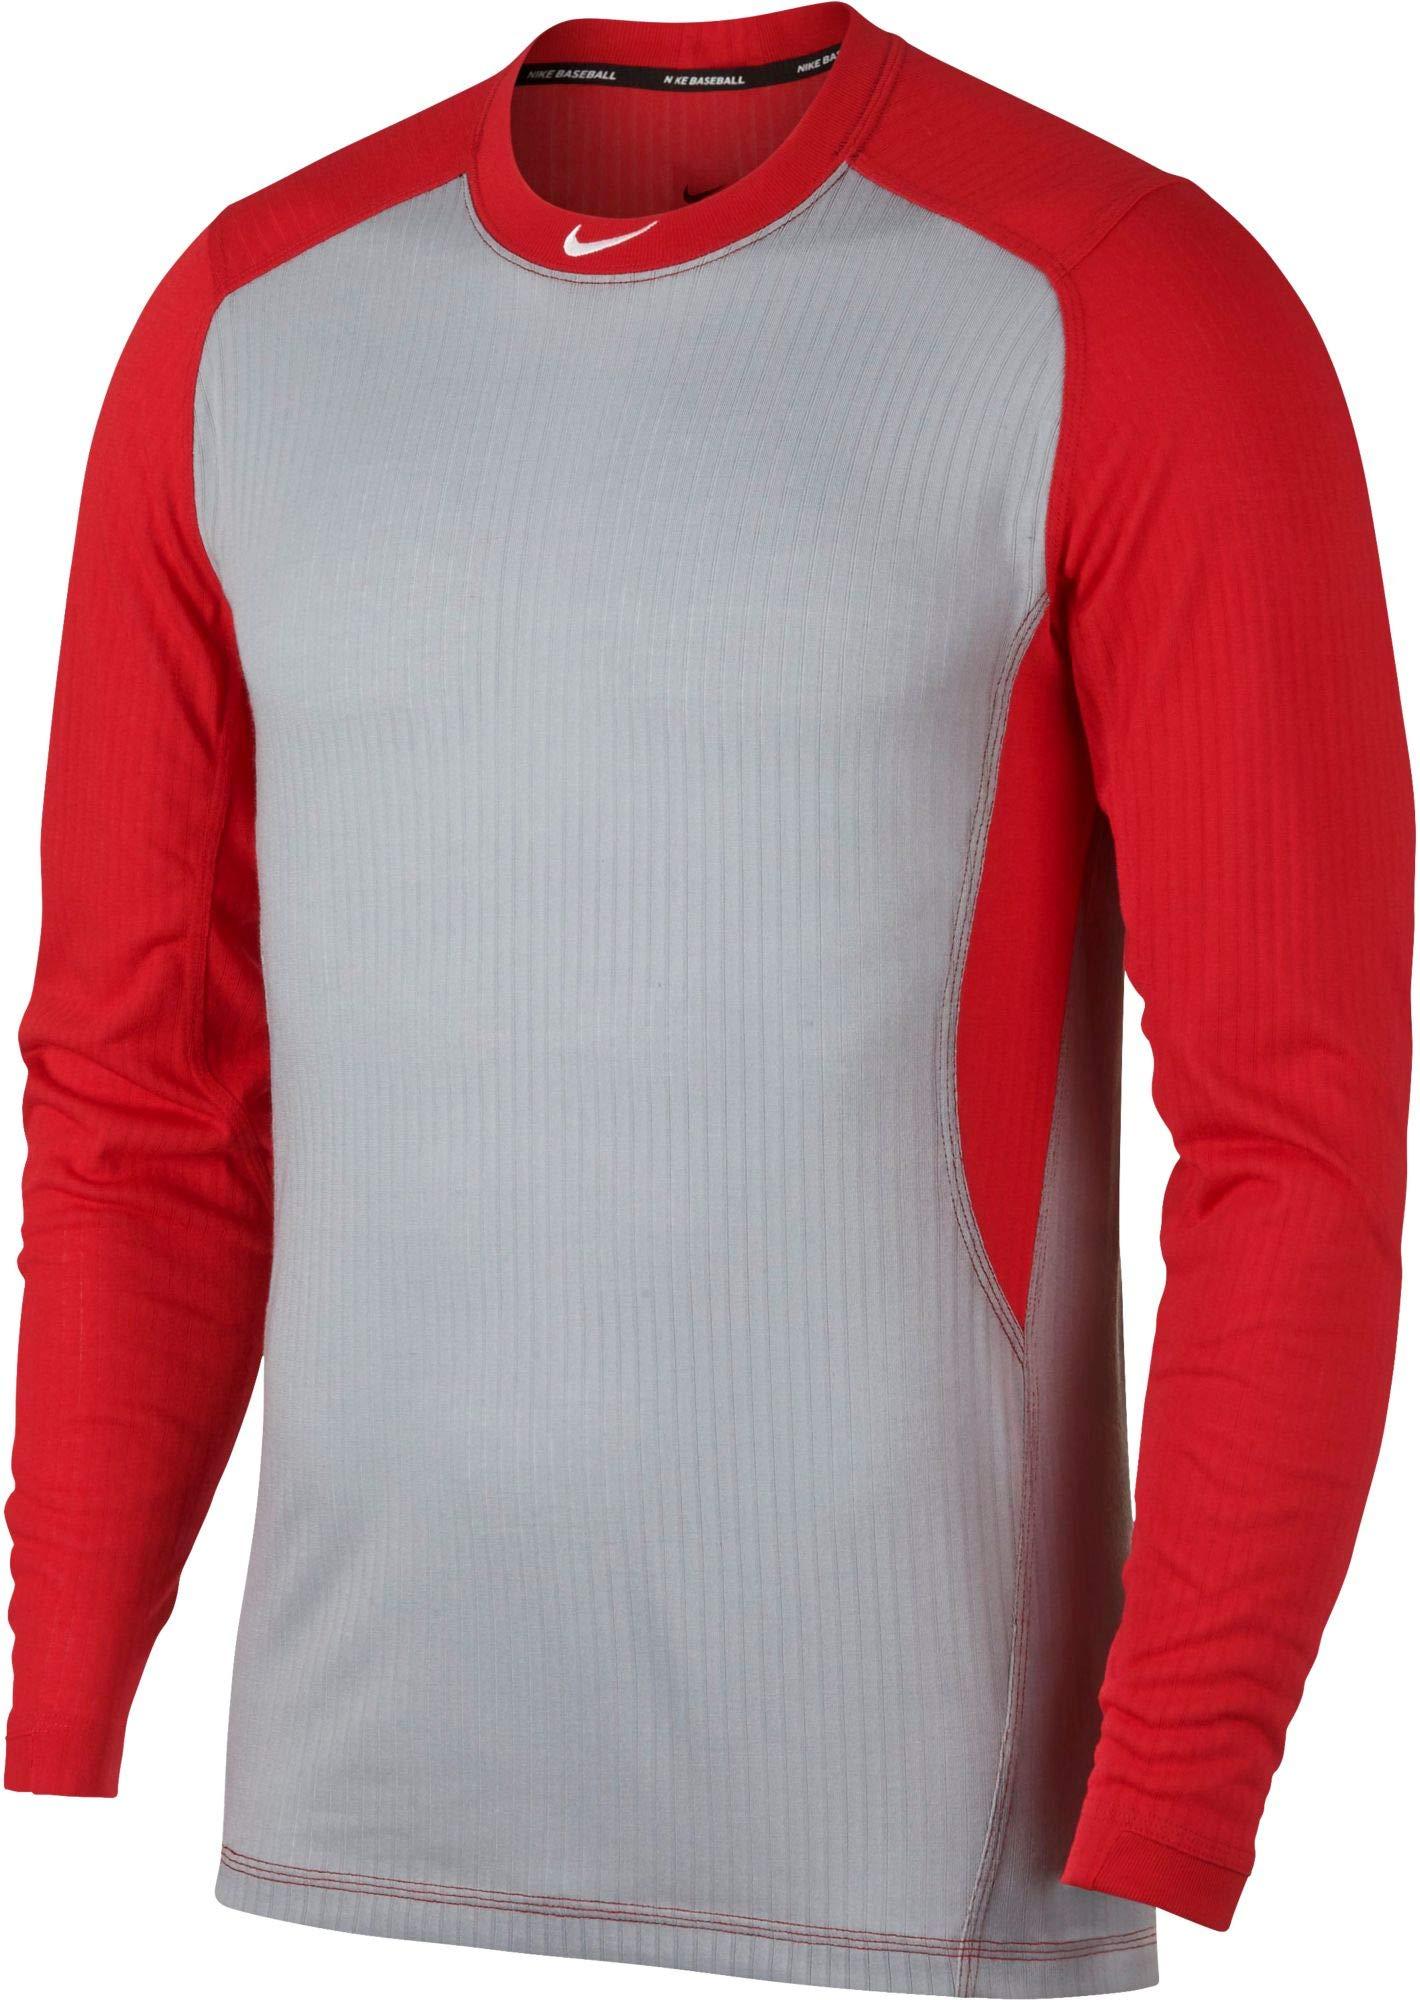 NIKE Men's Long-Sleeve Baseball Top (Wolf Grey/University Red, Medium)